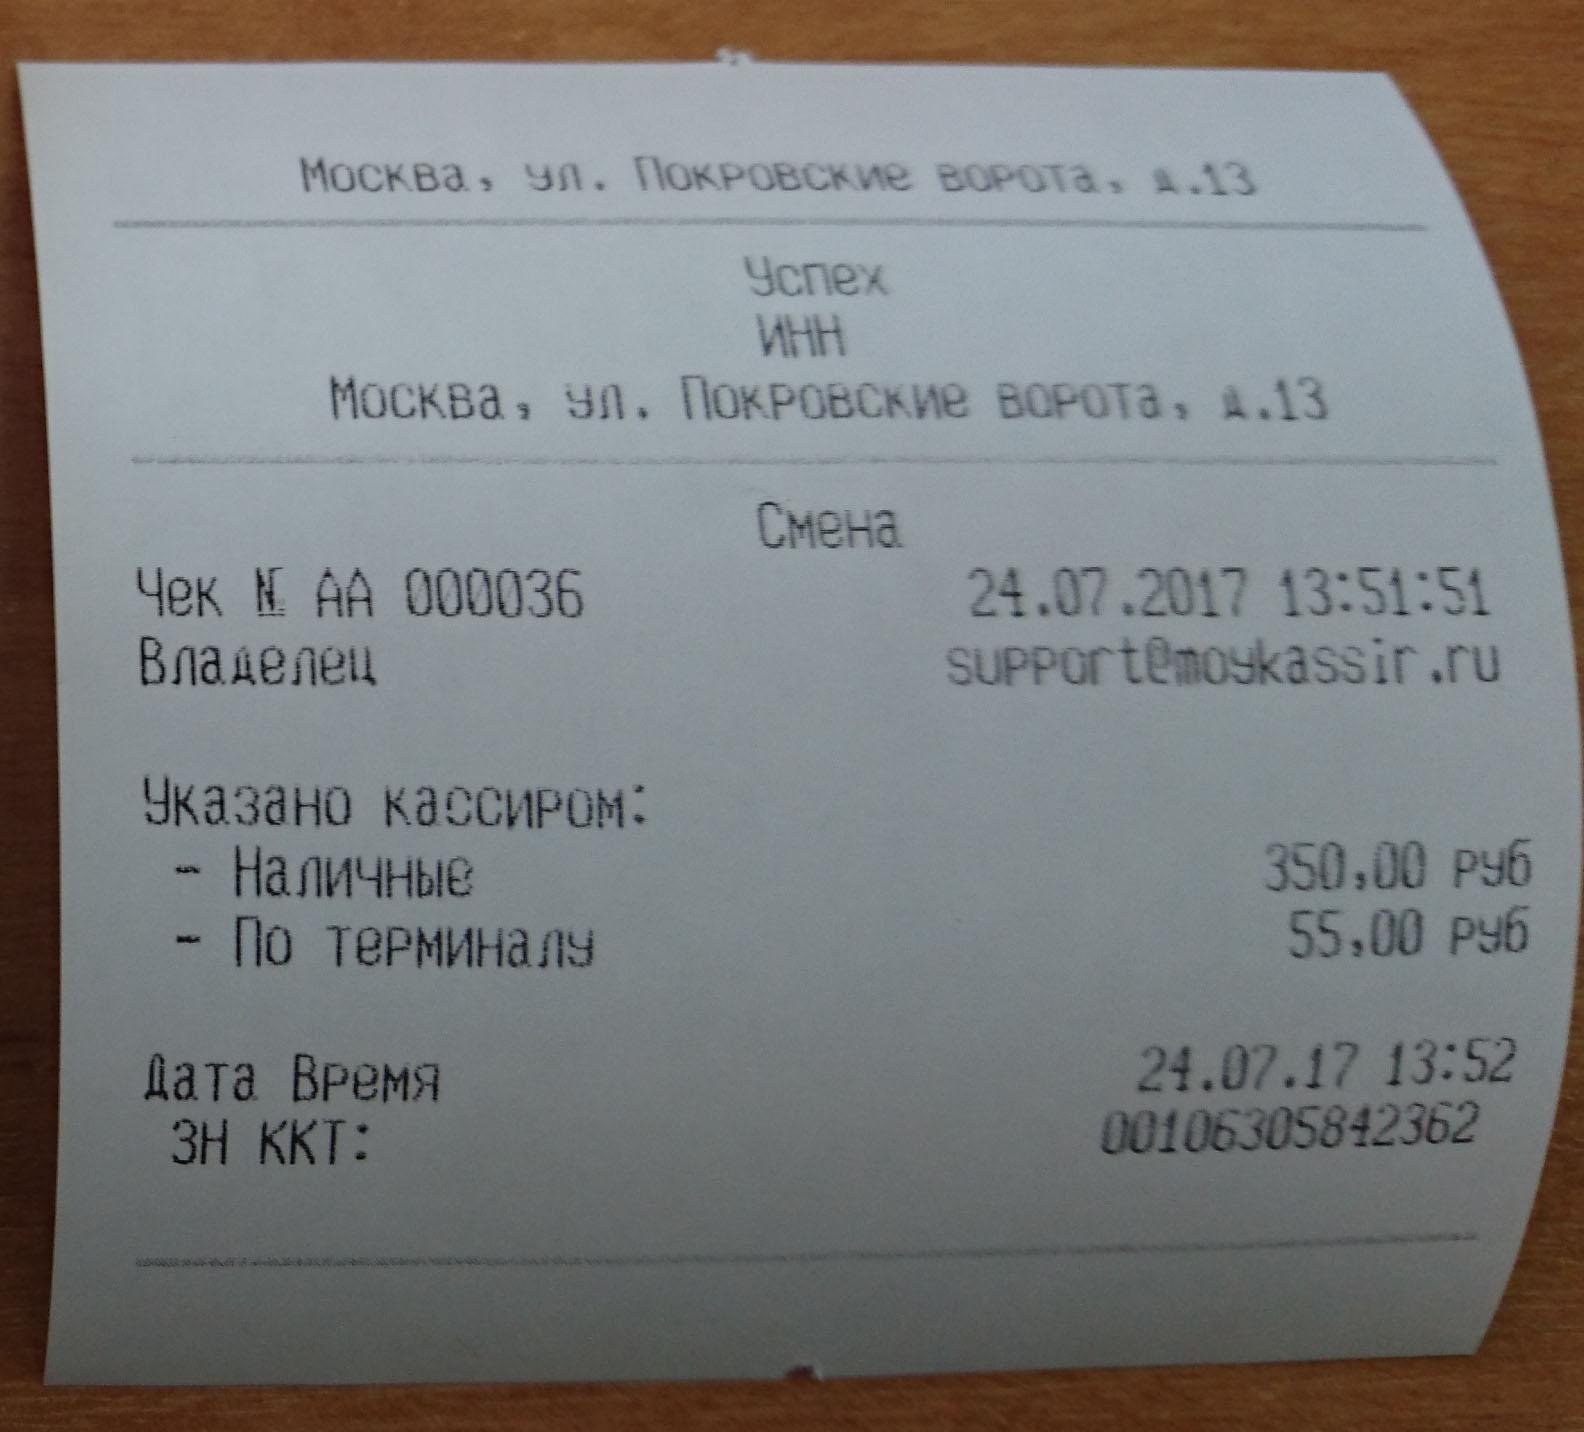 f87bfa8e5259eceed01c0b81b7763eac.jpg